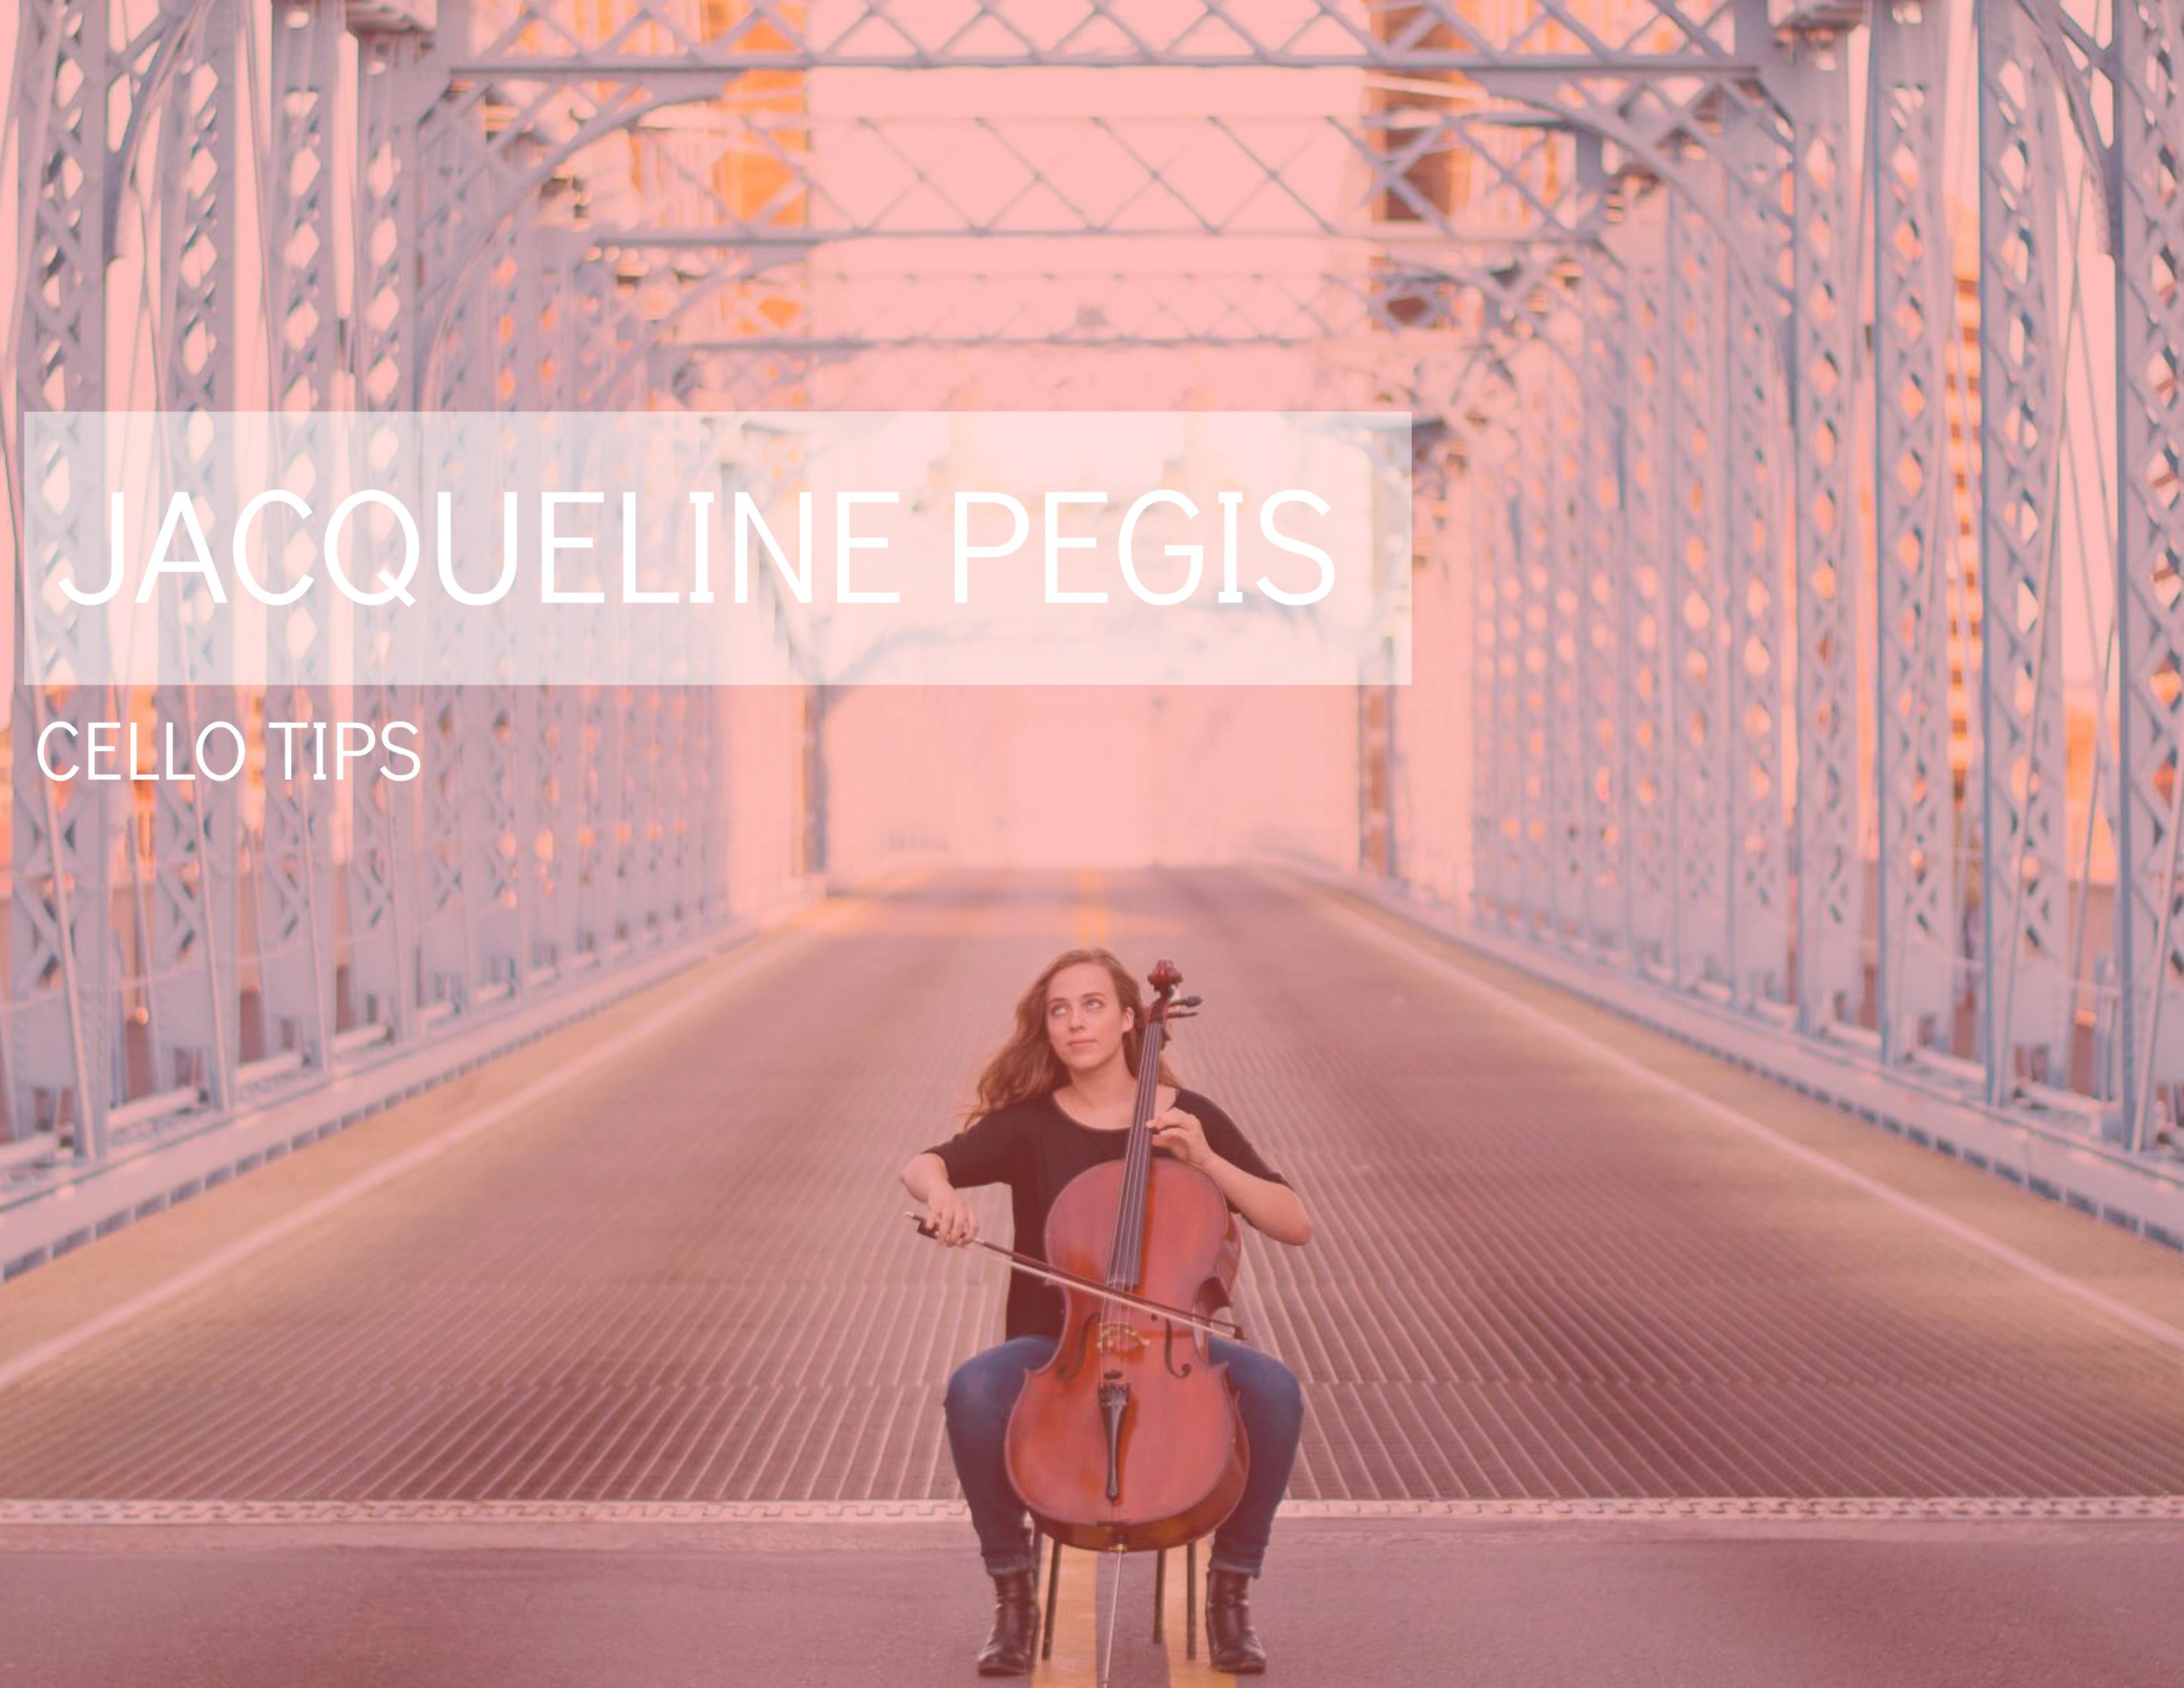 Jacqueline Pegis cello tips